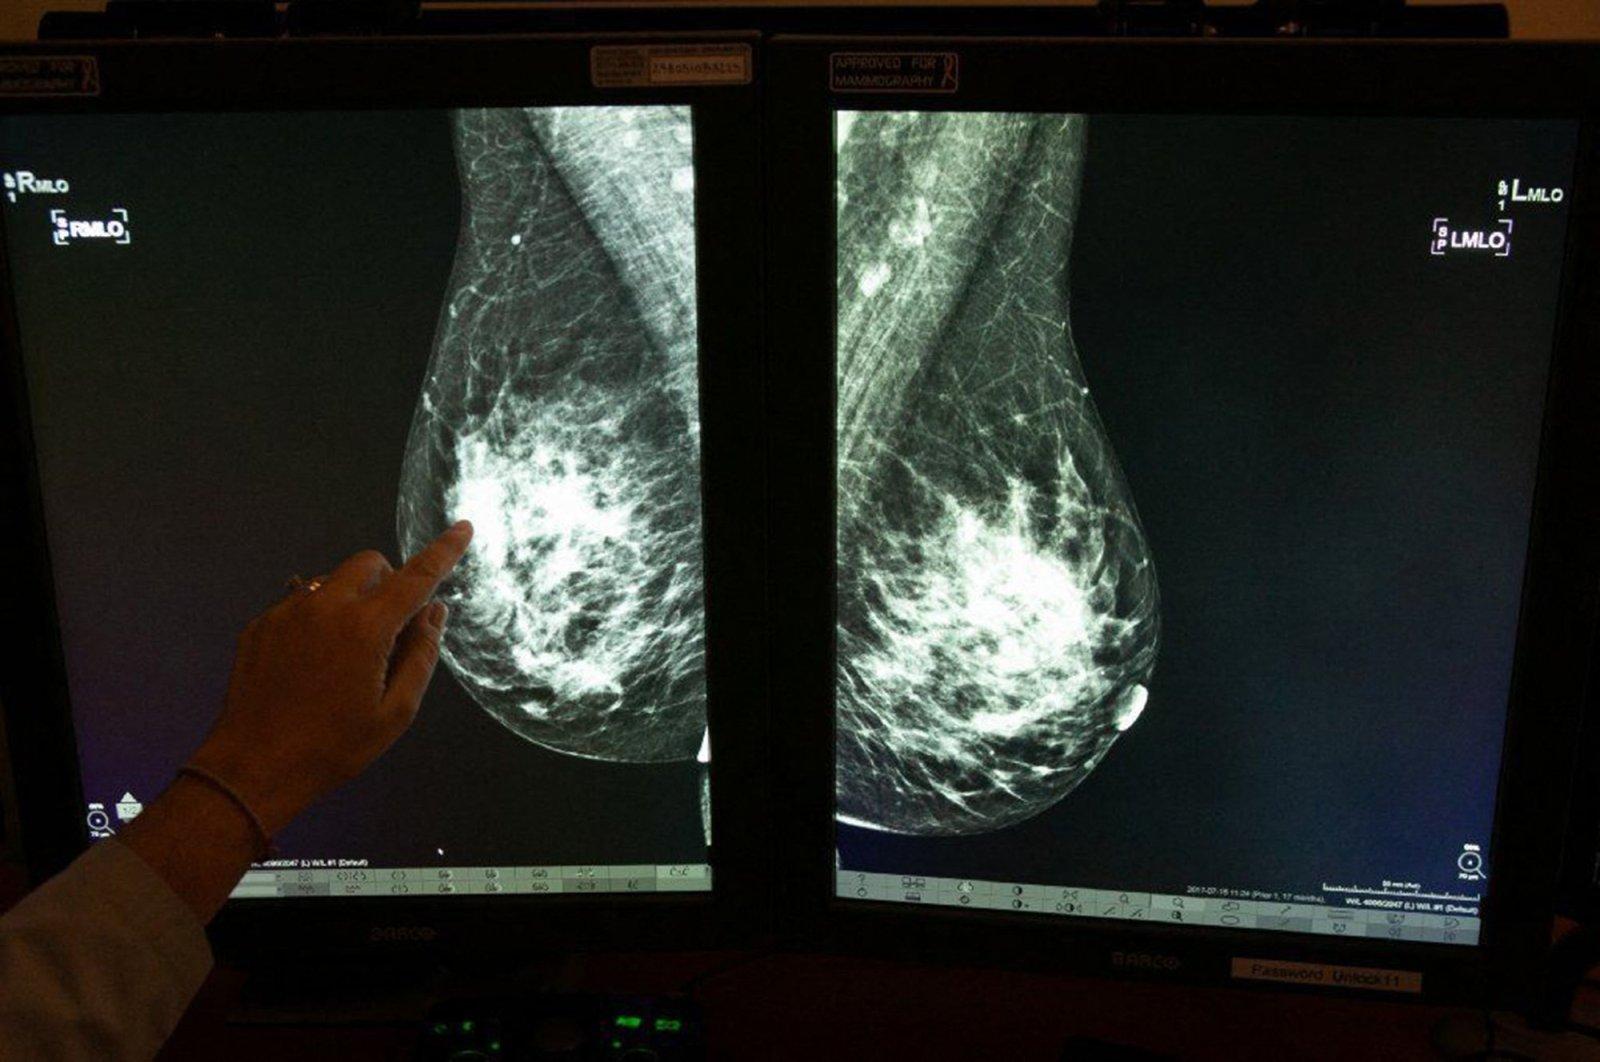 Dr. Georgia Giakoumis Spear points to dense breast tissue on a mammogram at Skokie Hospital on December 5, 2018. (via REUTERS)